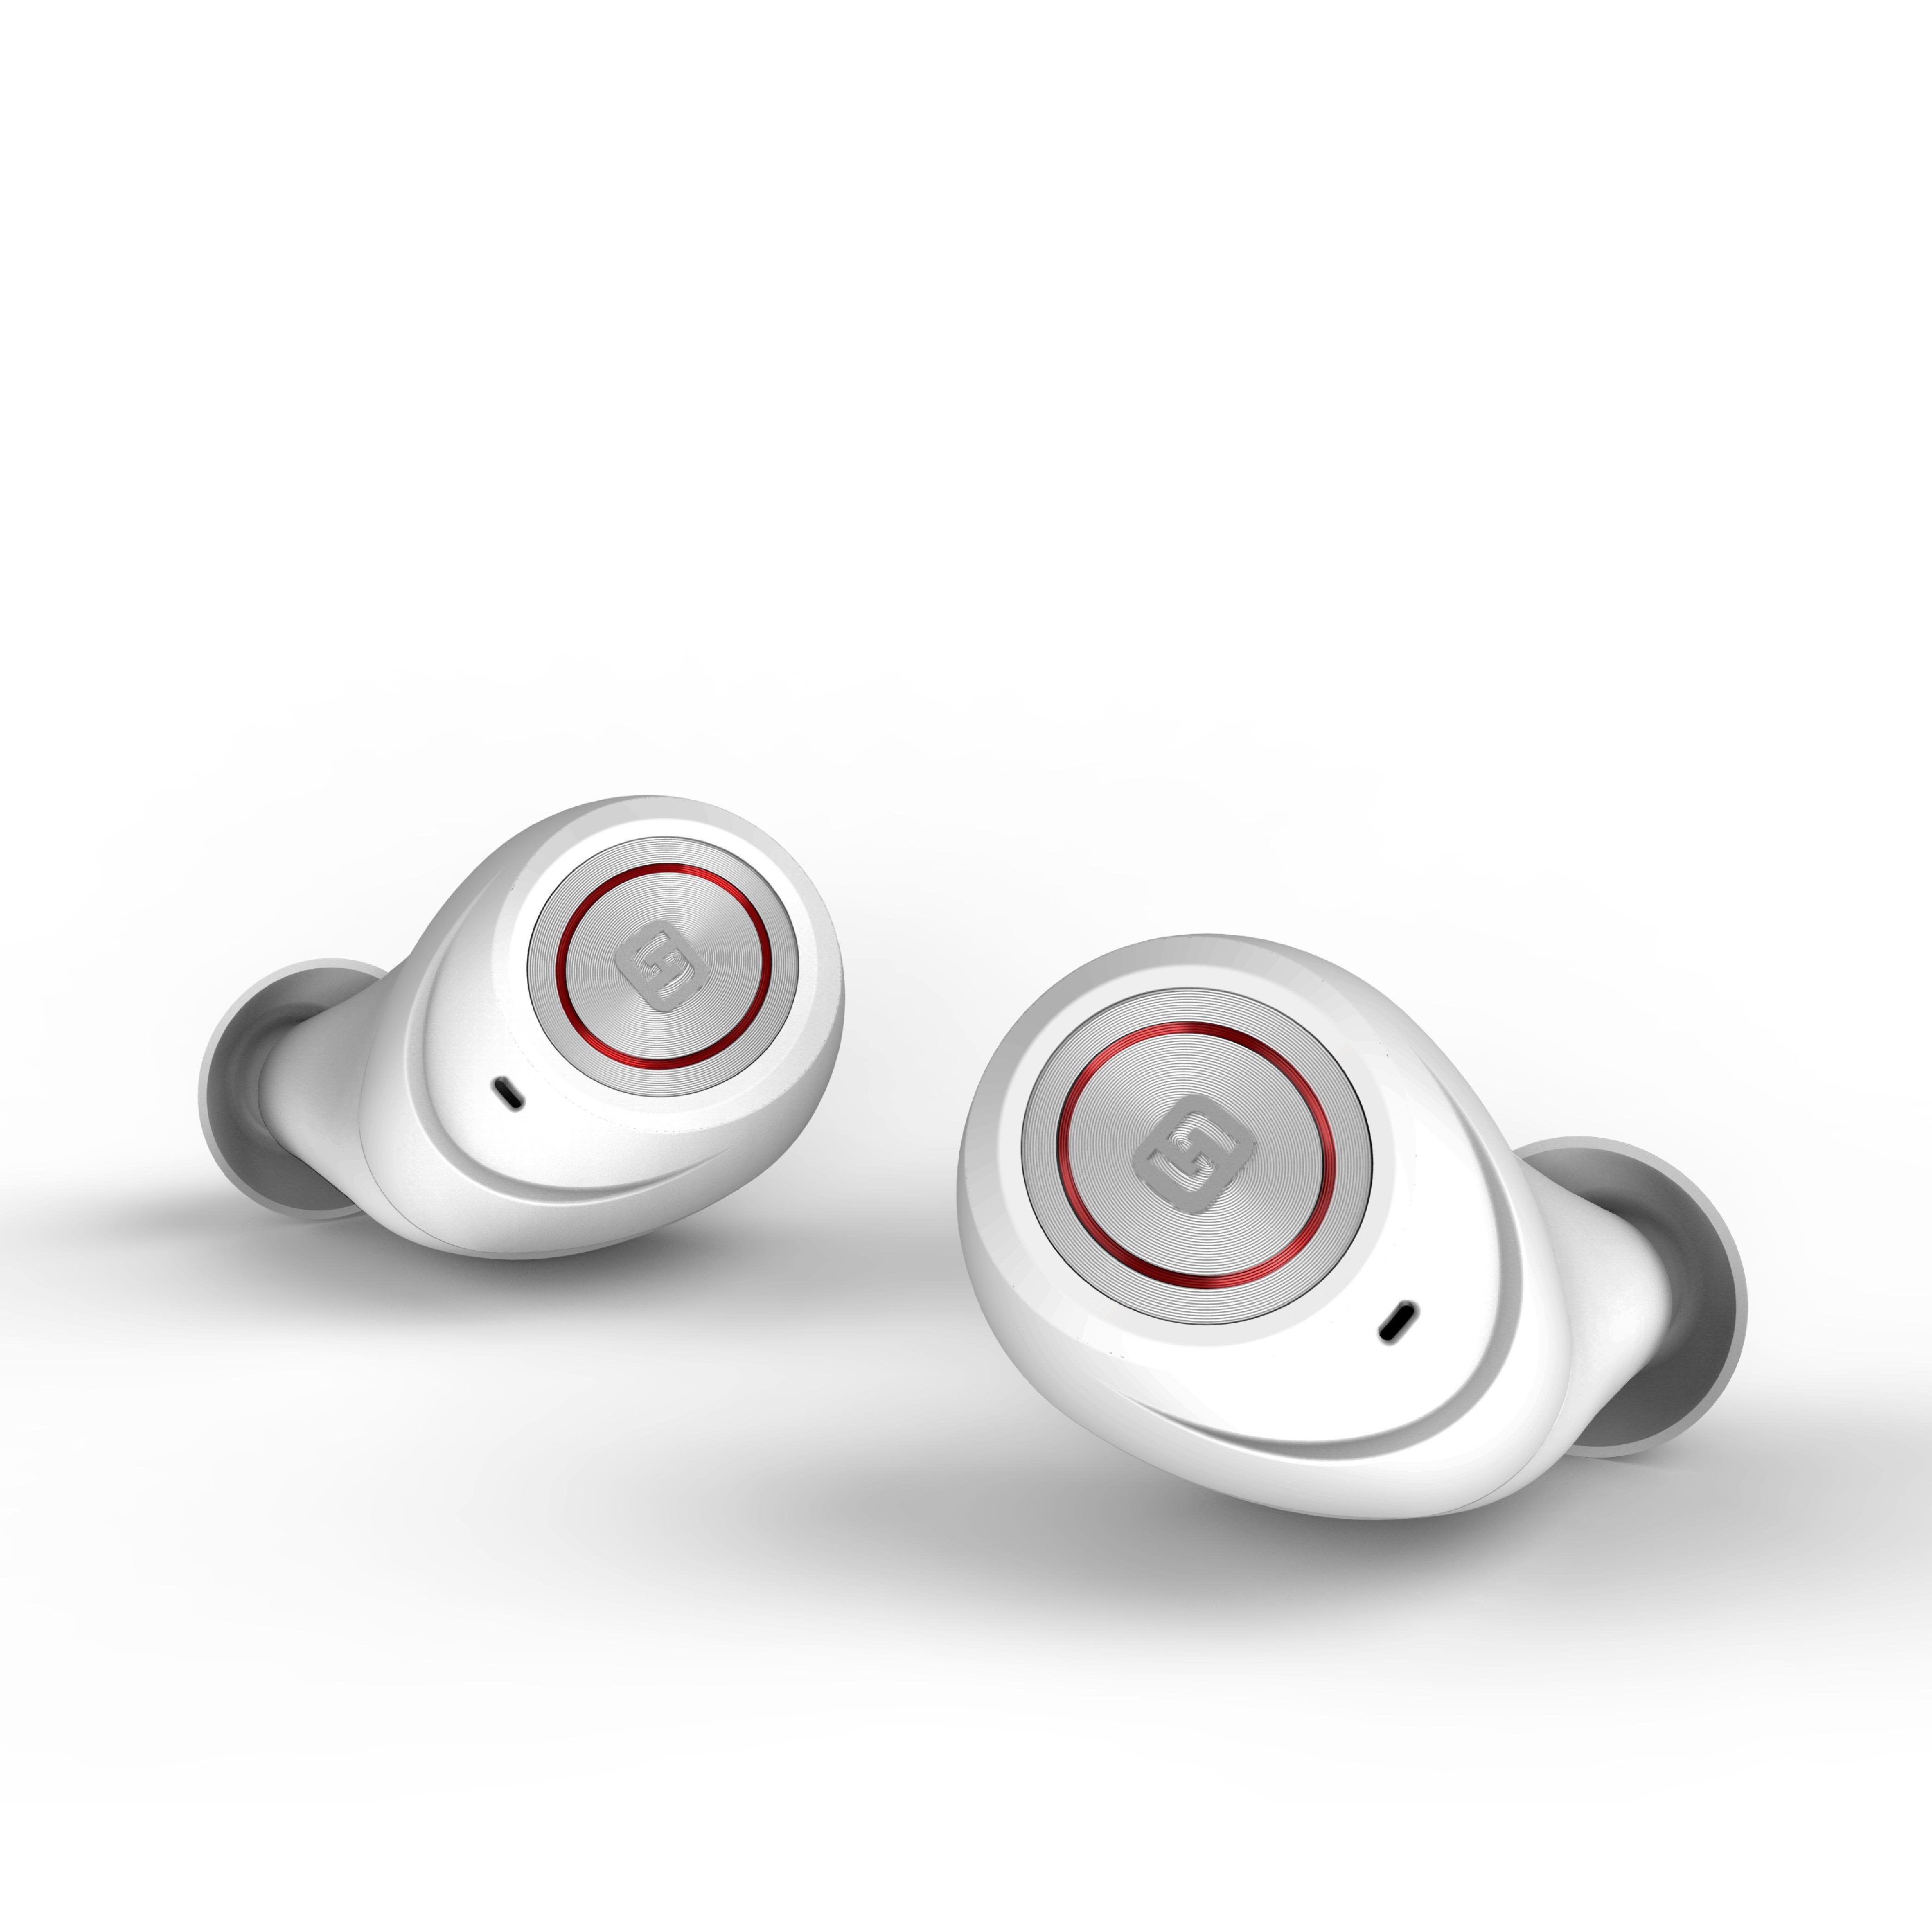 Tai nghe Bluetooth 5.0 - Tai nghe TWS - TidyBuds Pro -  HiFuture - Best Sound - Stereo call&music/Touch controls/Up to 108hr/Auto connect (Hàng chính hãng)